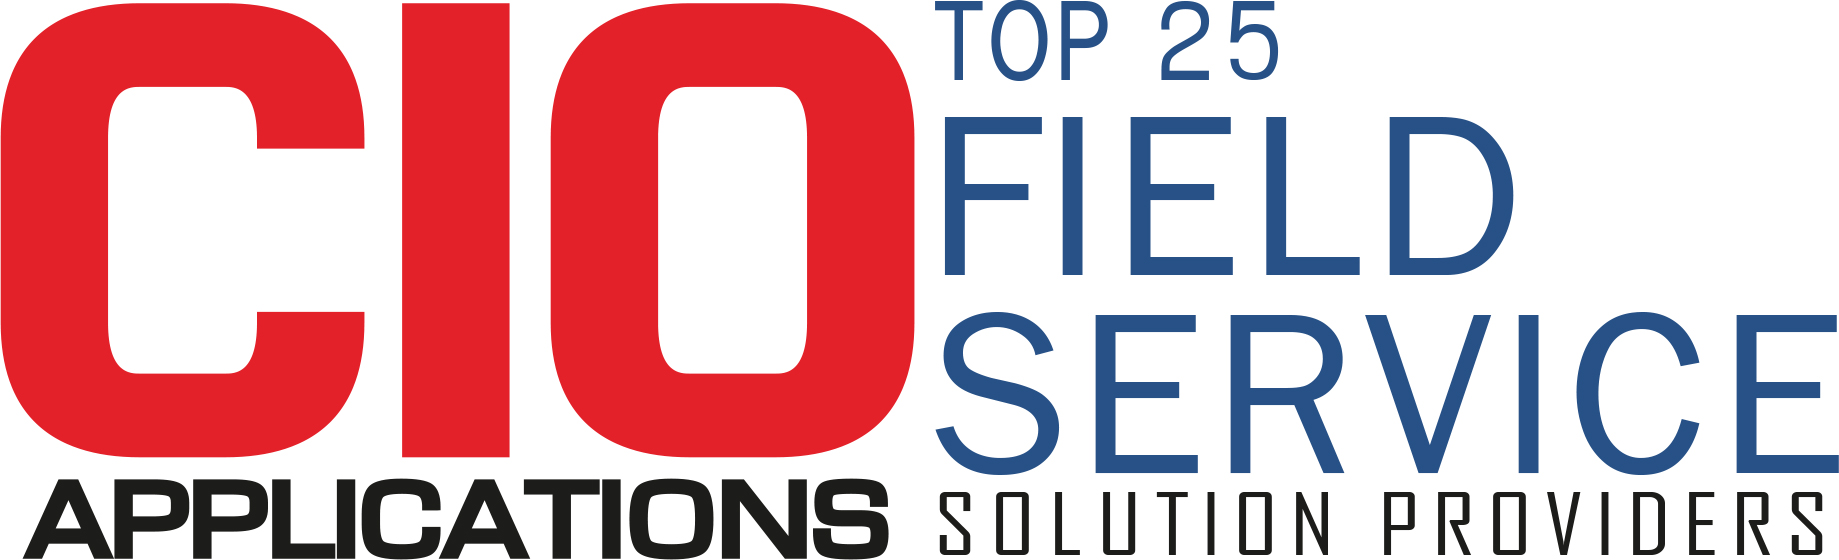 Top Field Service Tech Companies